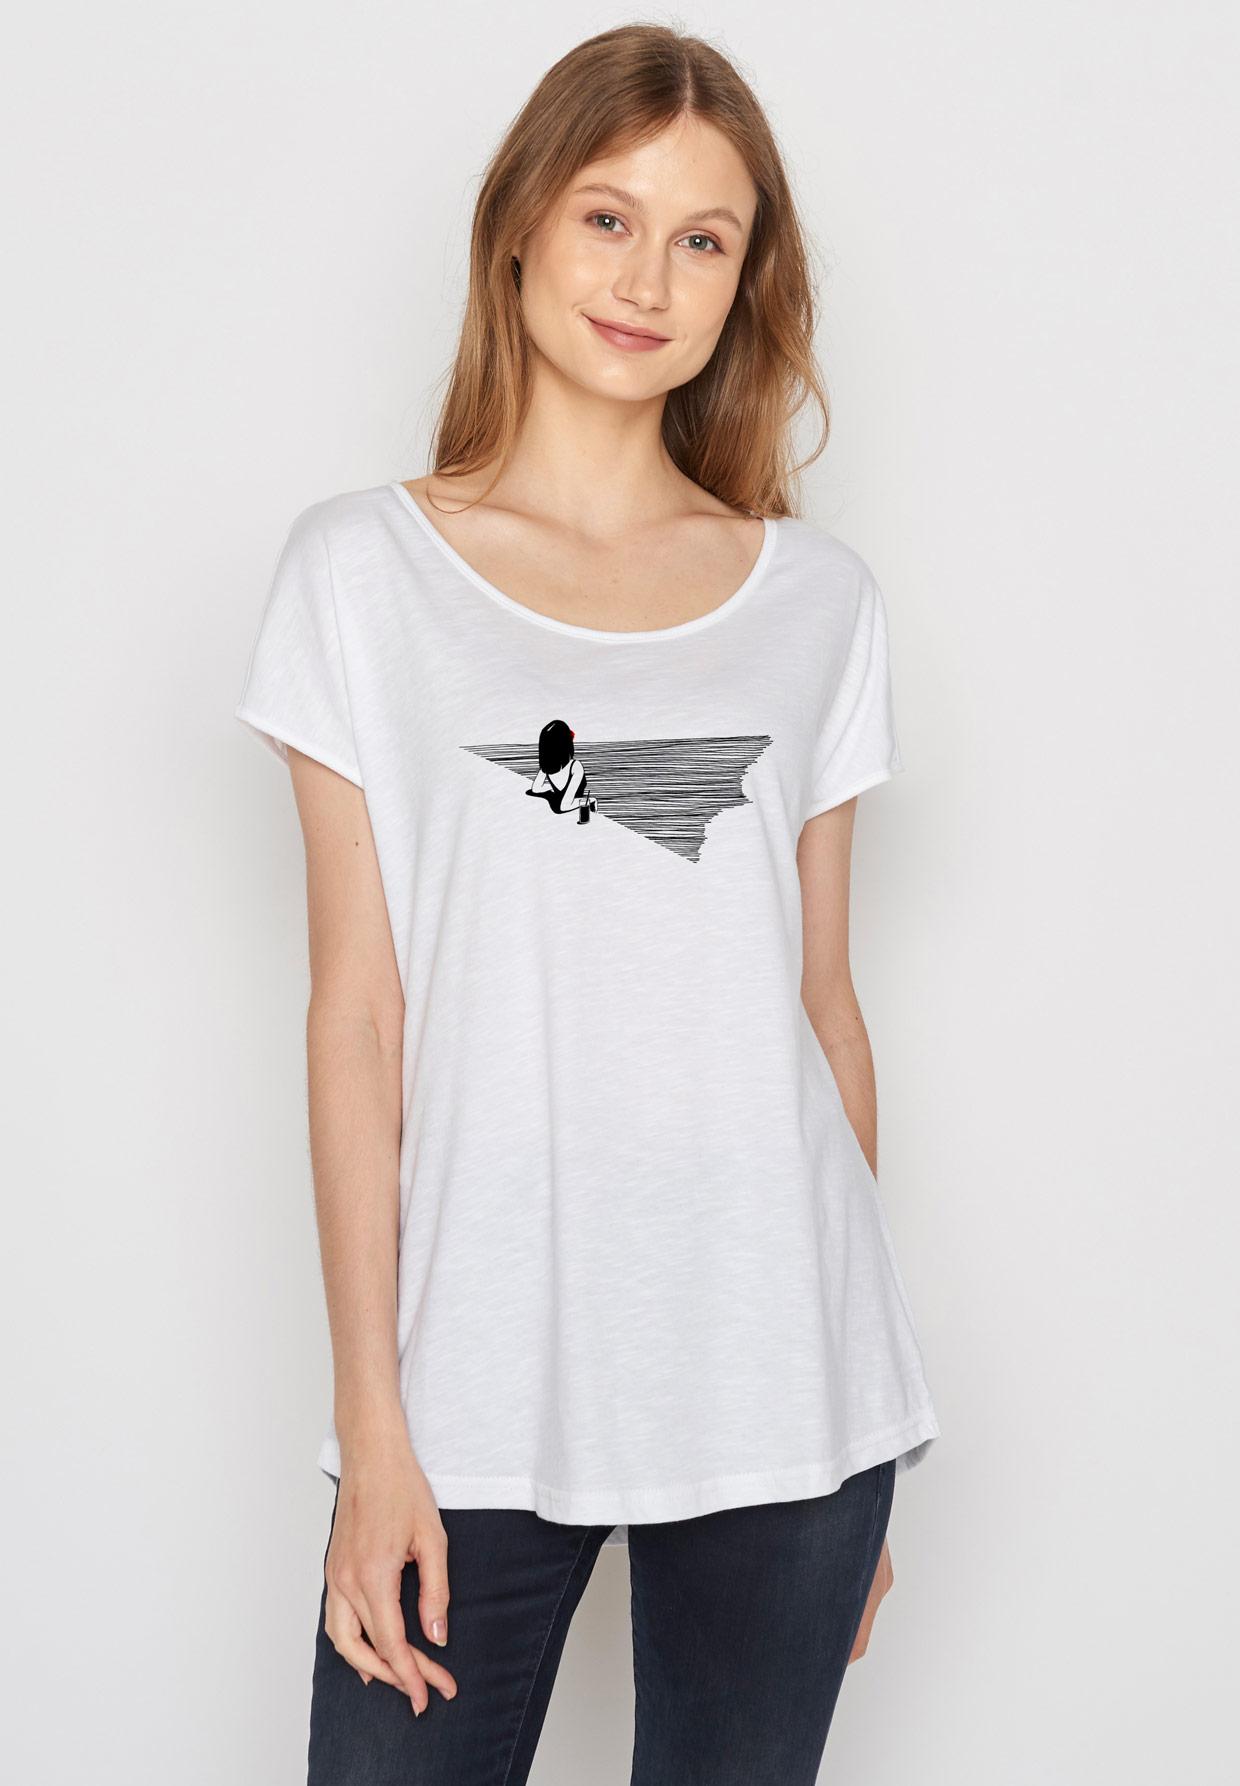 GREENBOMB-NATURE-BEACH-FELLING-Cool-Shirt-white